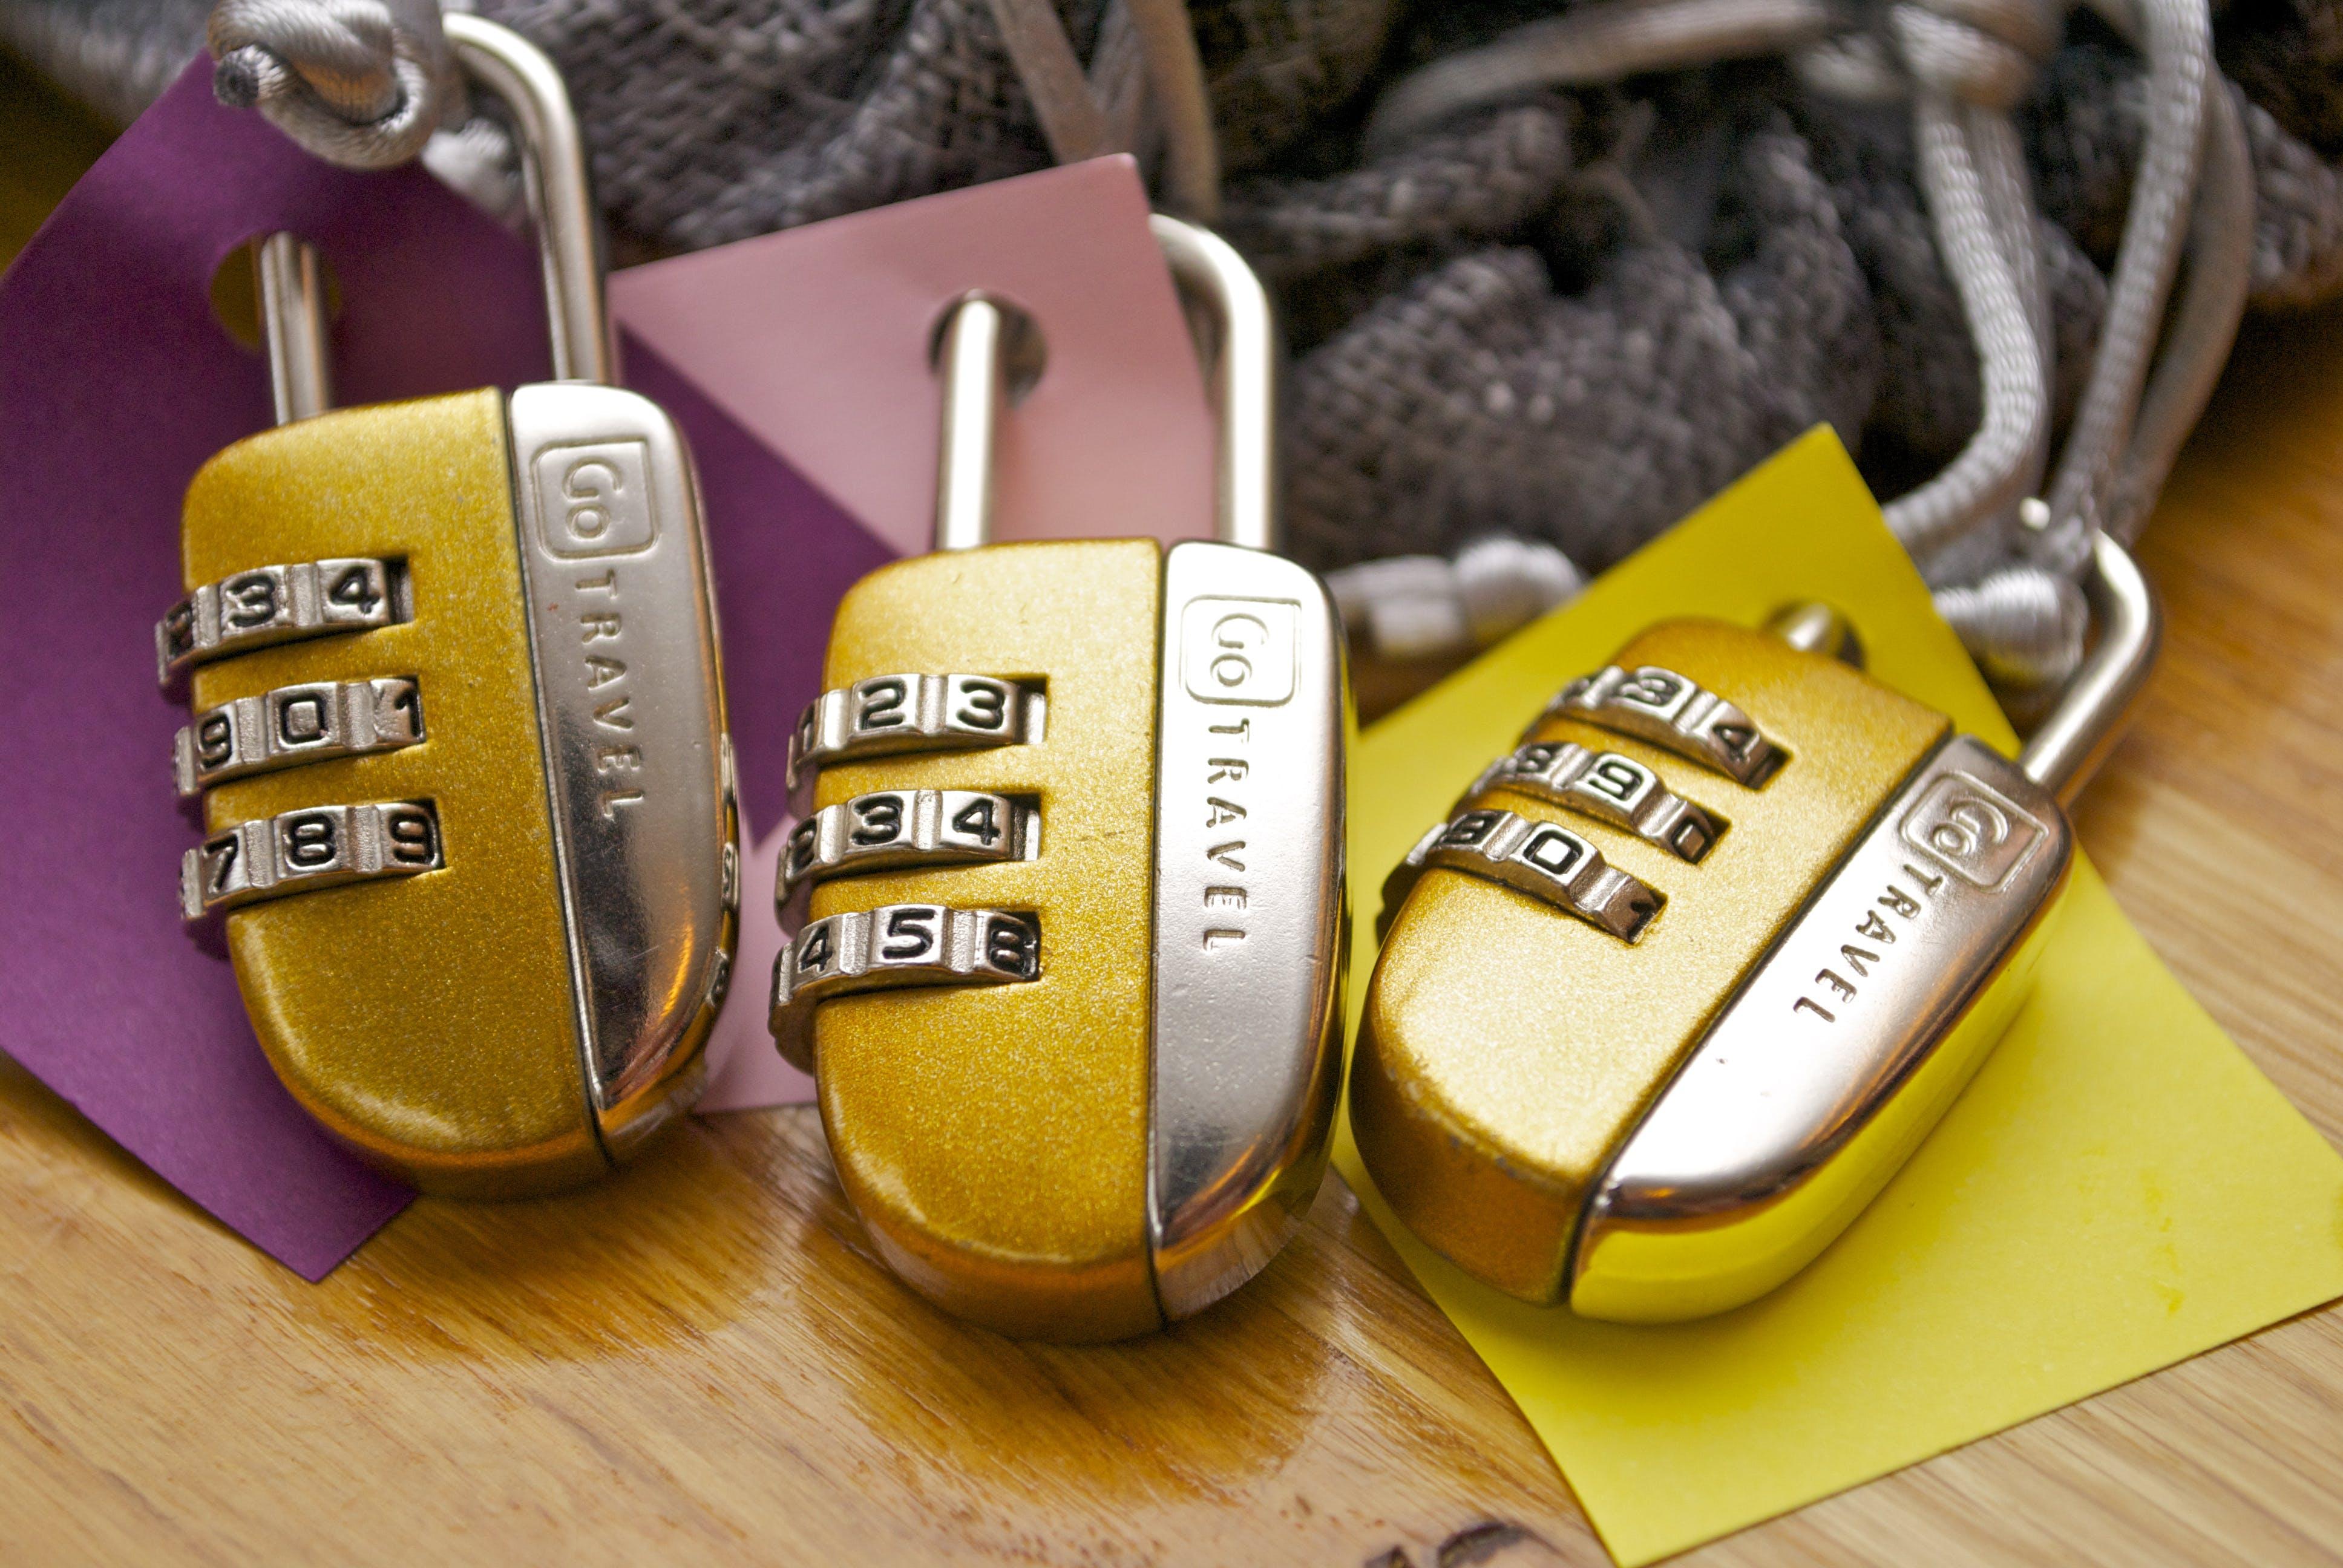 Three Gold-and-silver Combination Padlocks